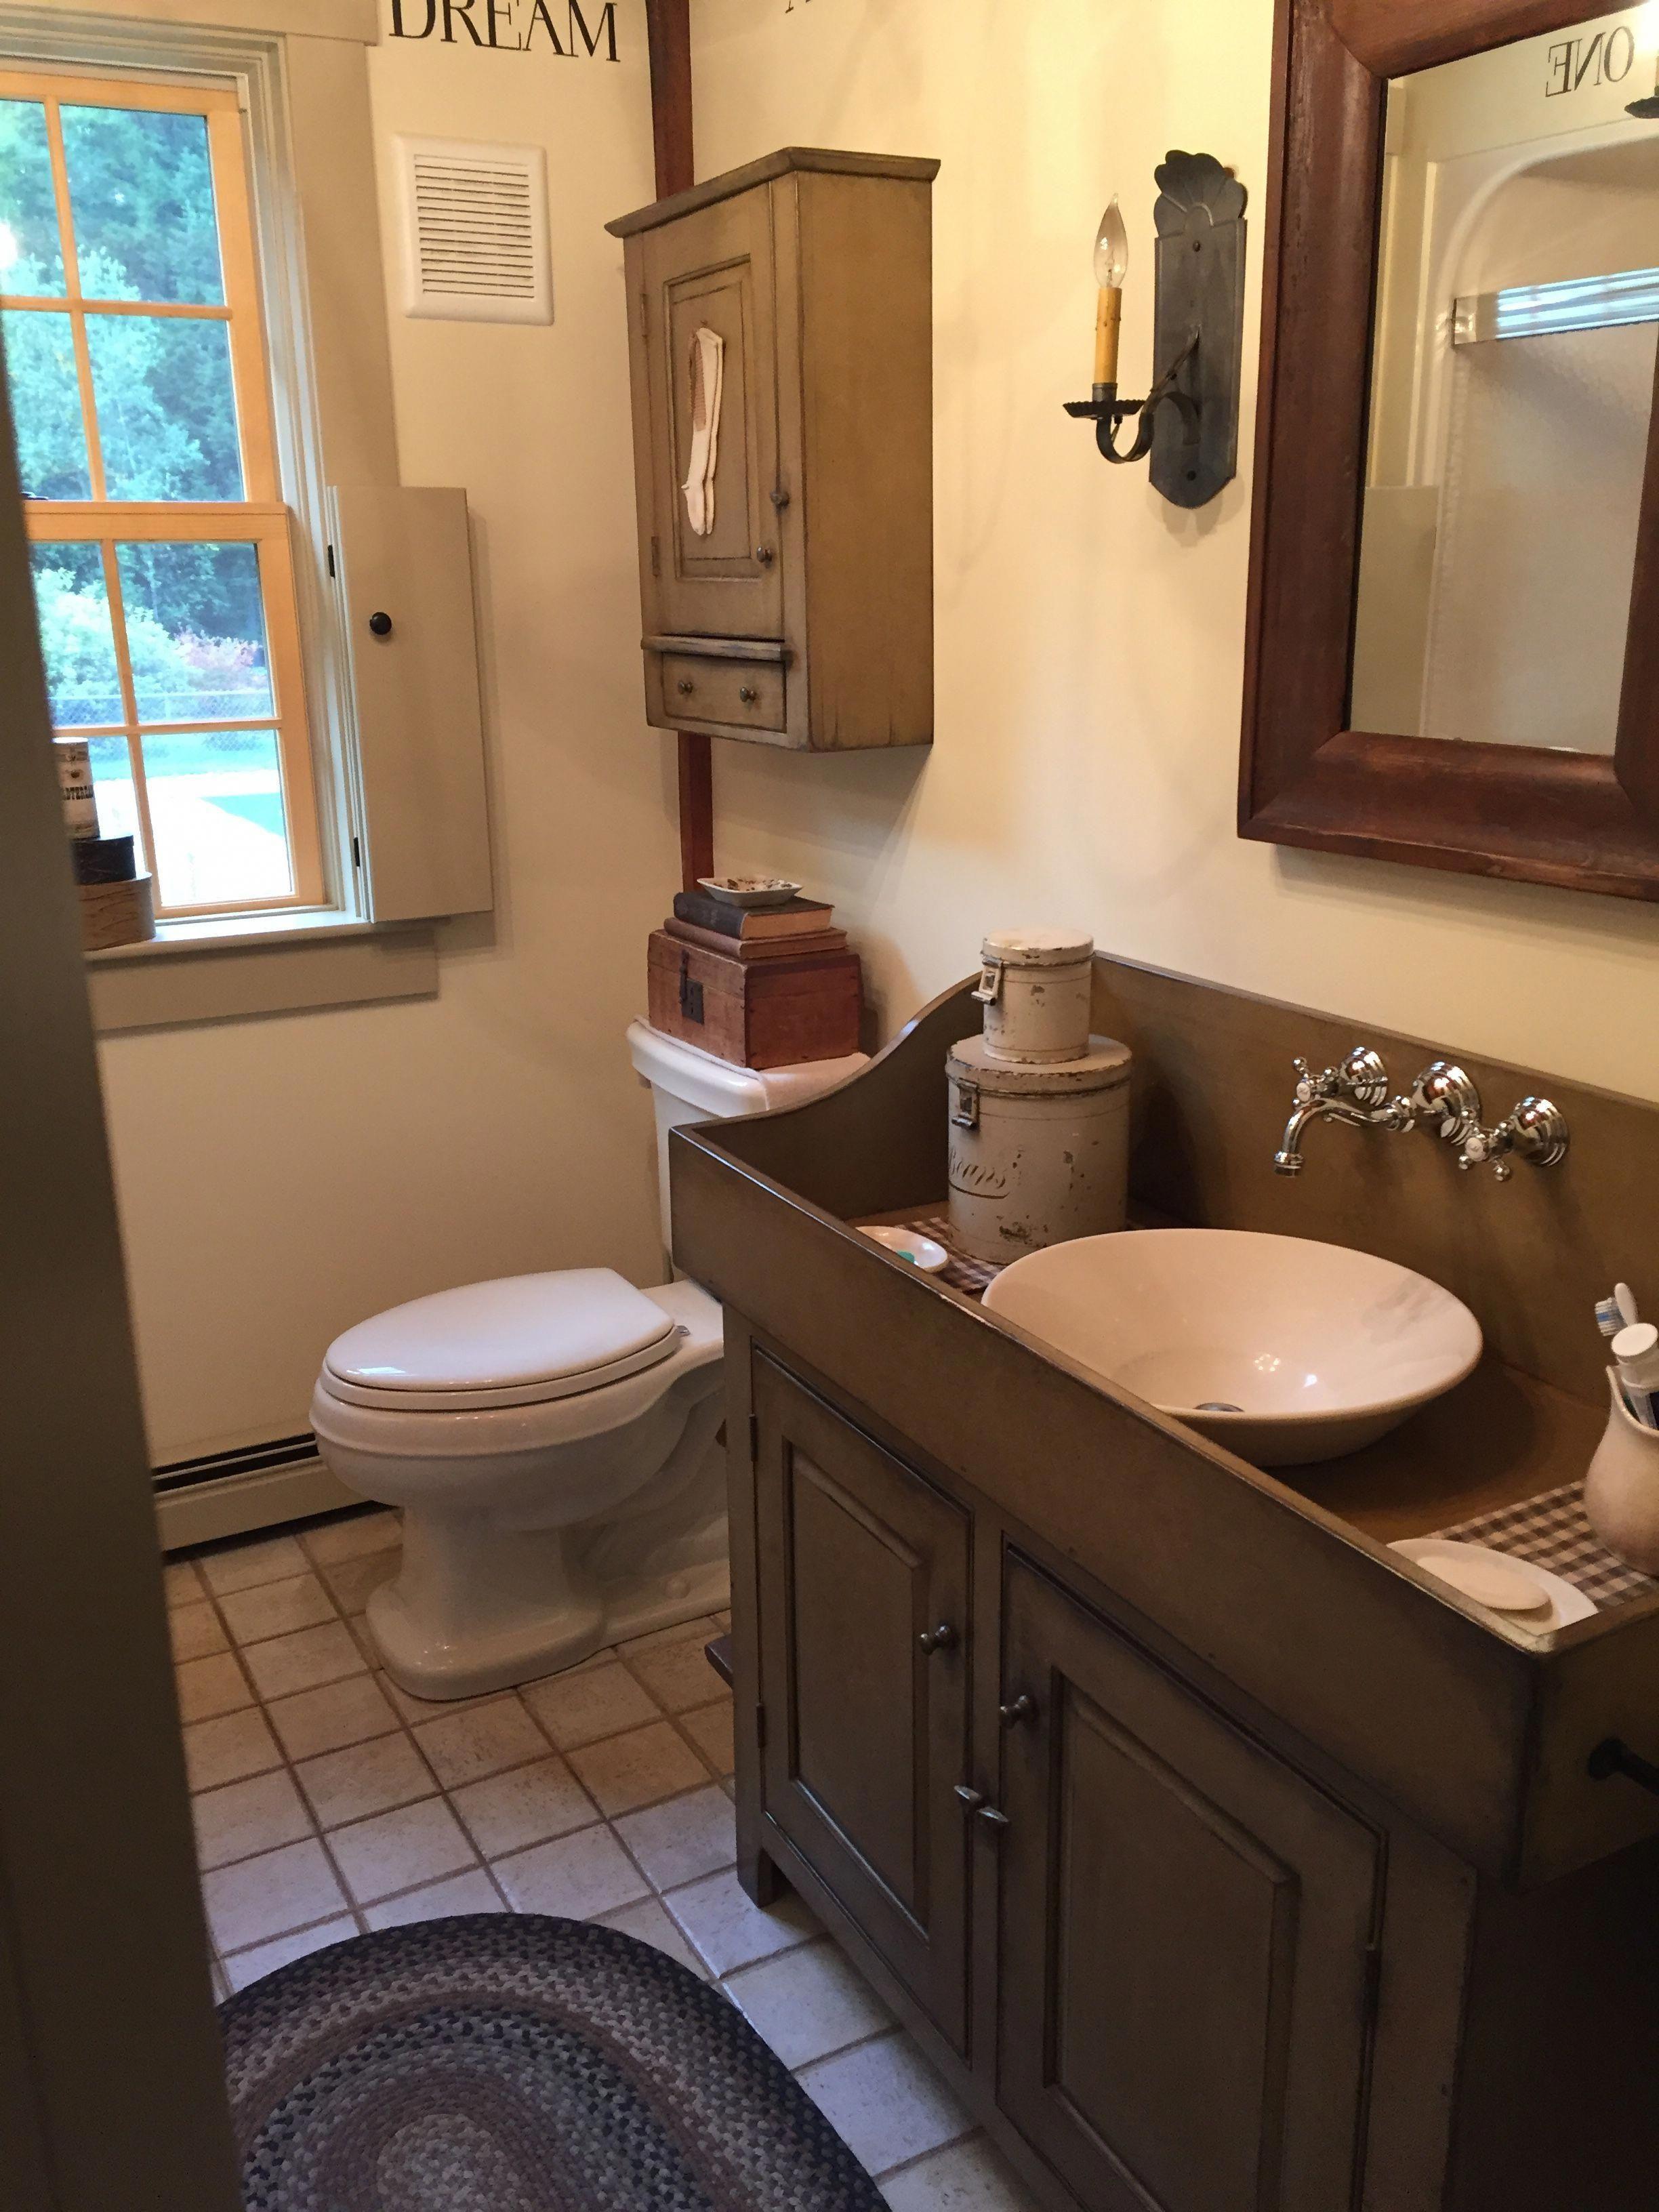 10 Impressive Rustic Diy Sink Vanity Farmhouse Style Rustic Diy Sink Vanity Farmhouse Primitive Bathrooms Primitive Country Bathrooms Diy Sink Vanity